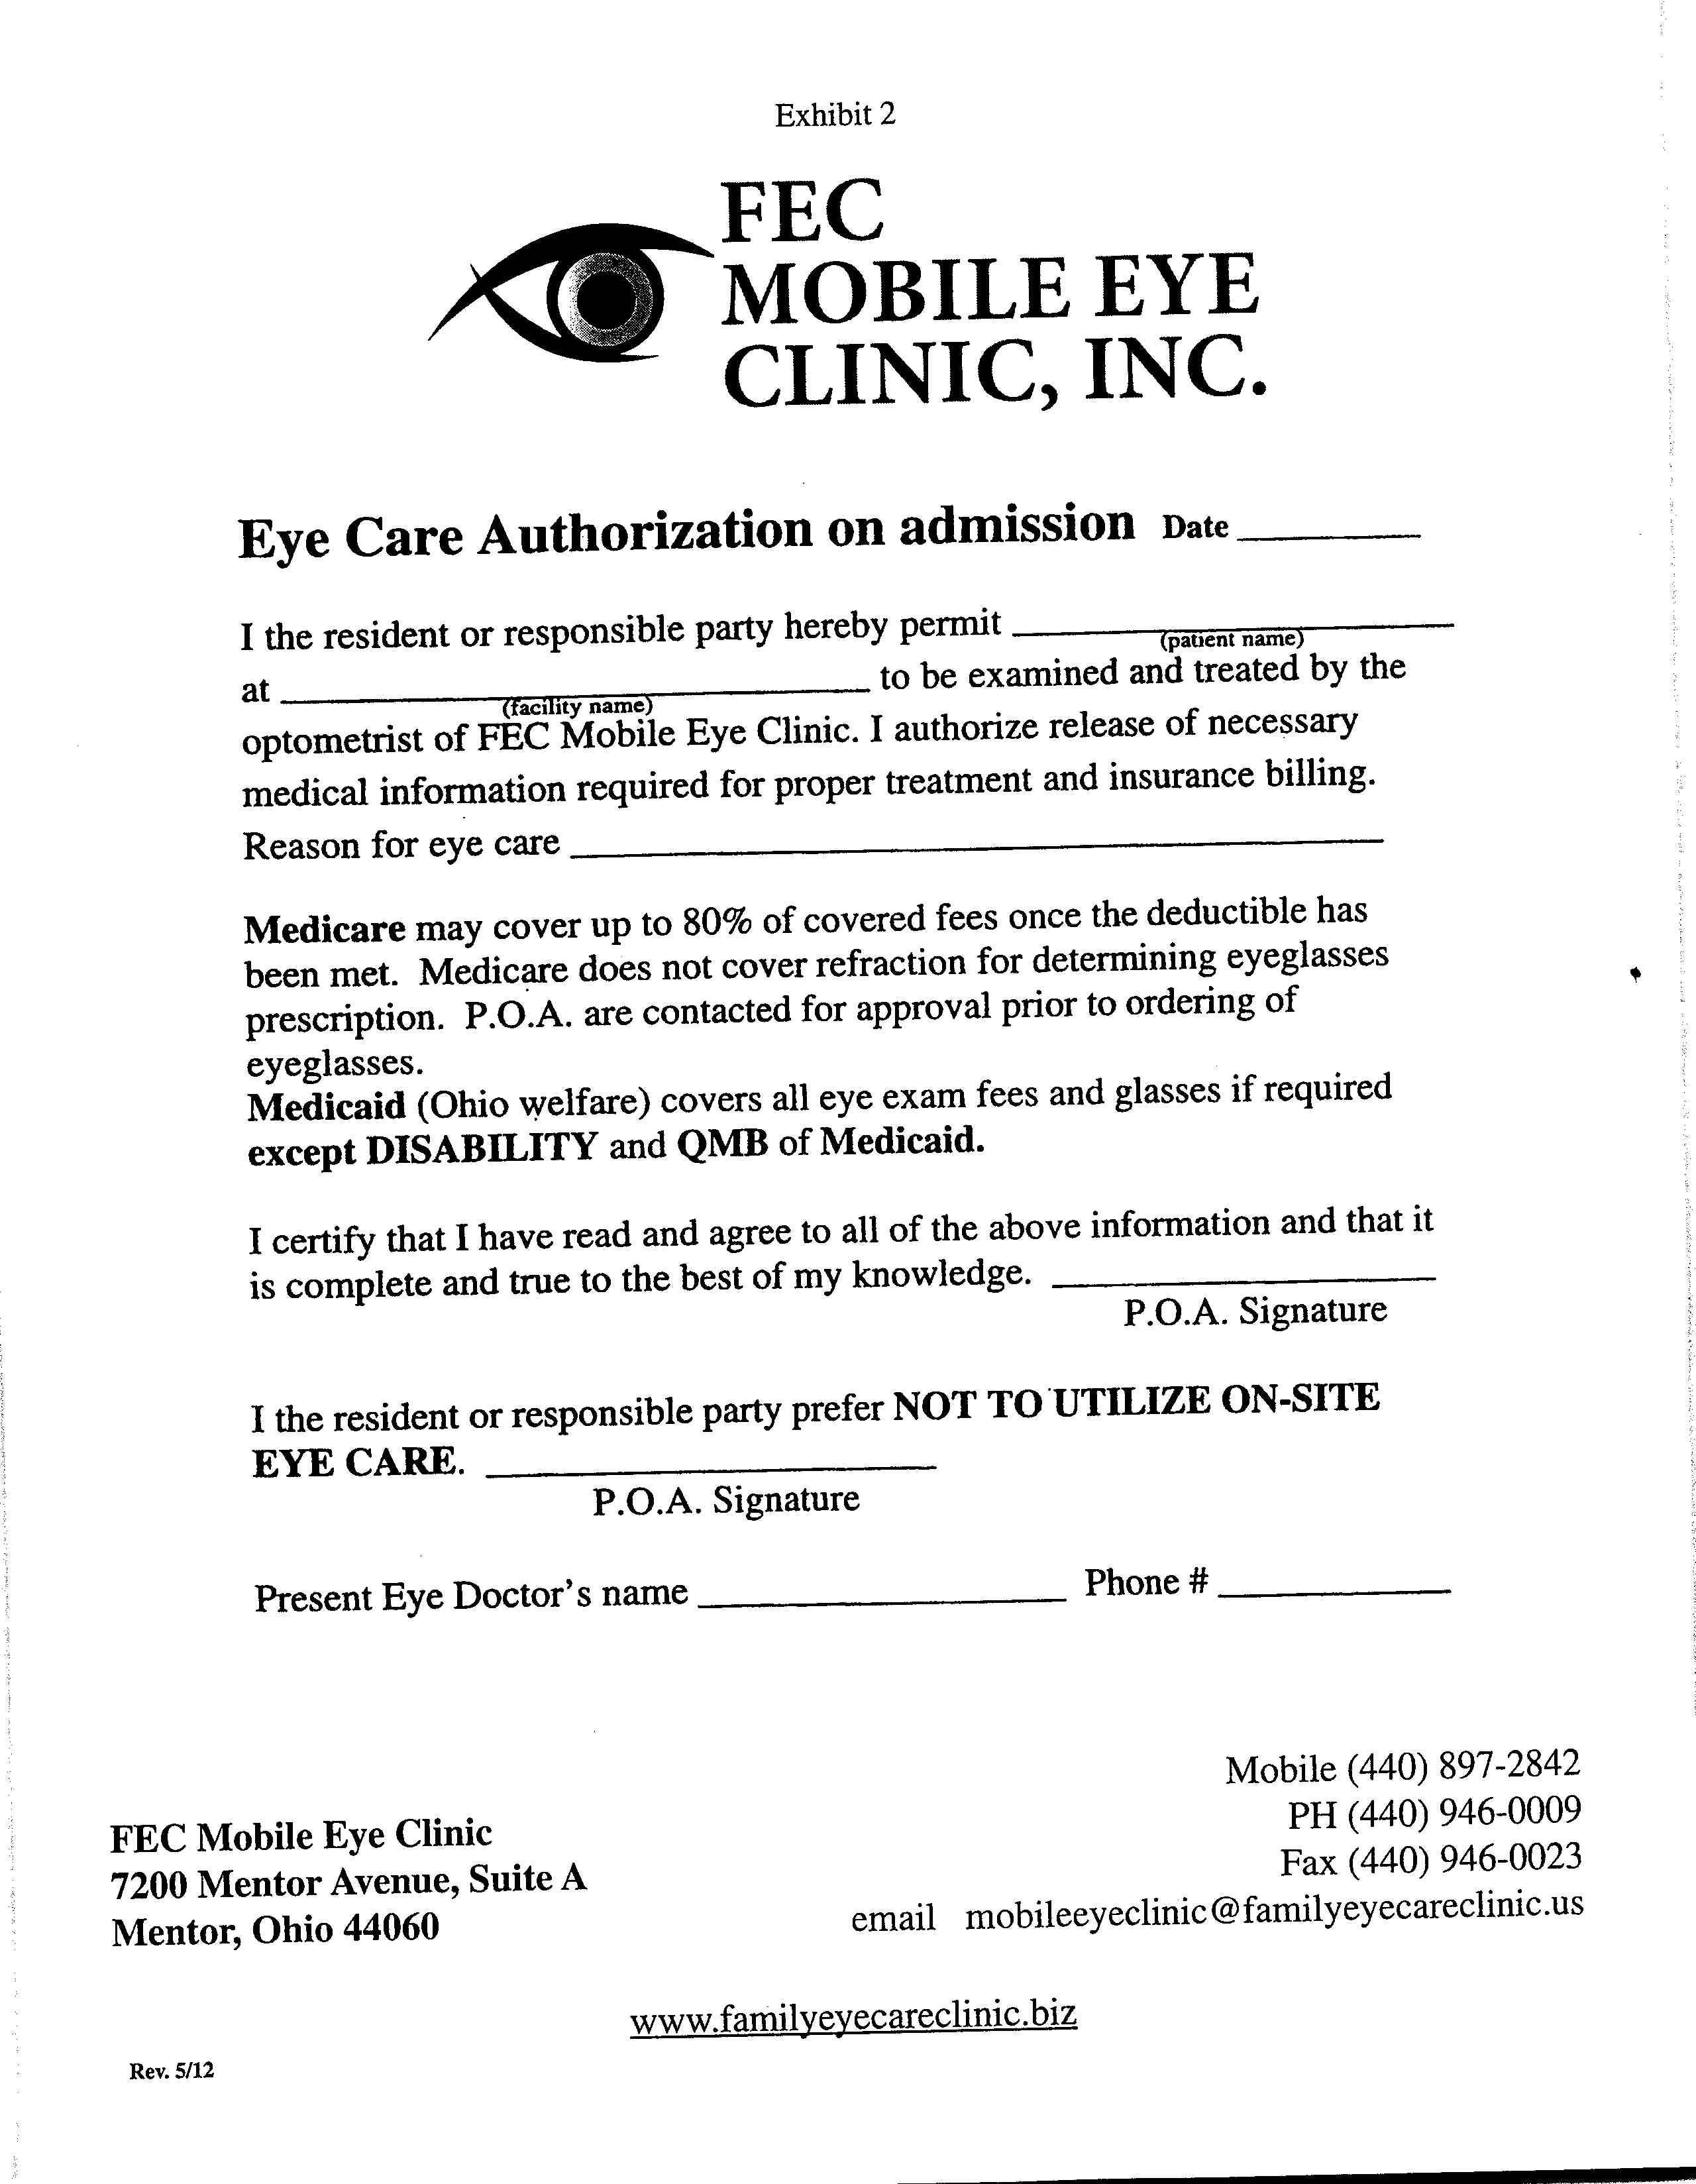 Mobile Eye Clinic | Home Visit Eye Doctor | Family EyeCare